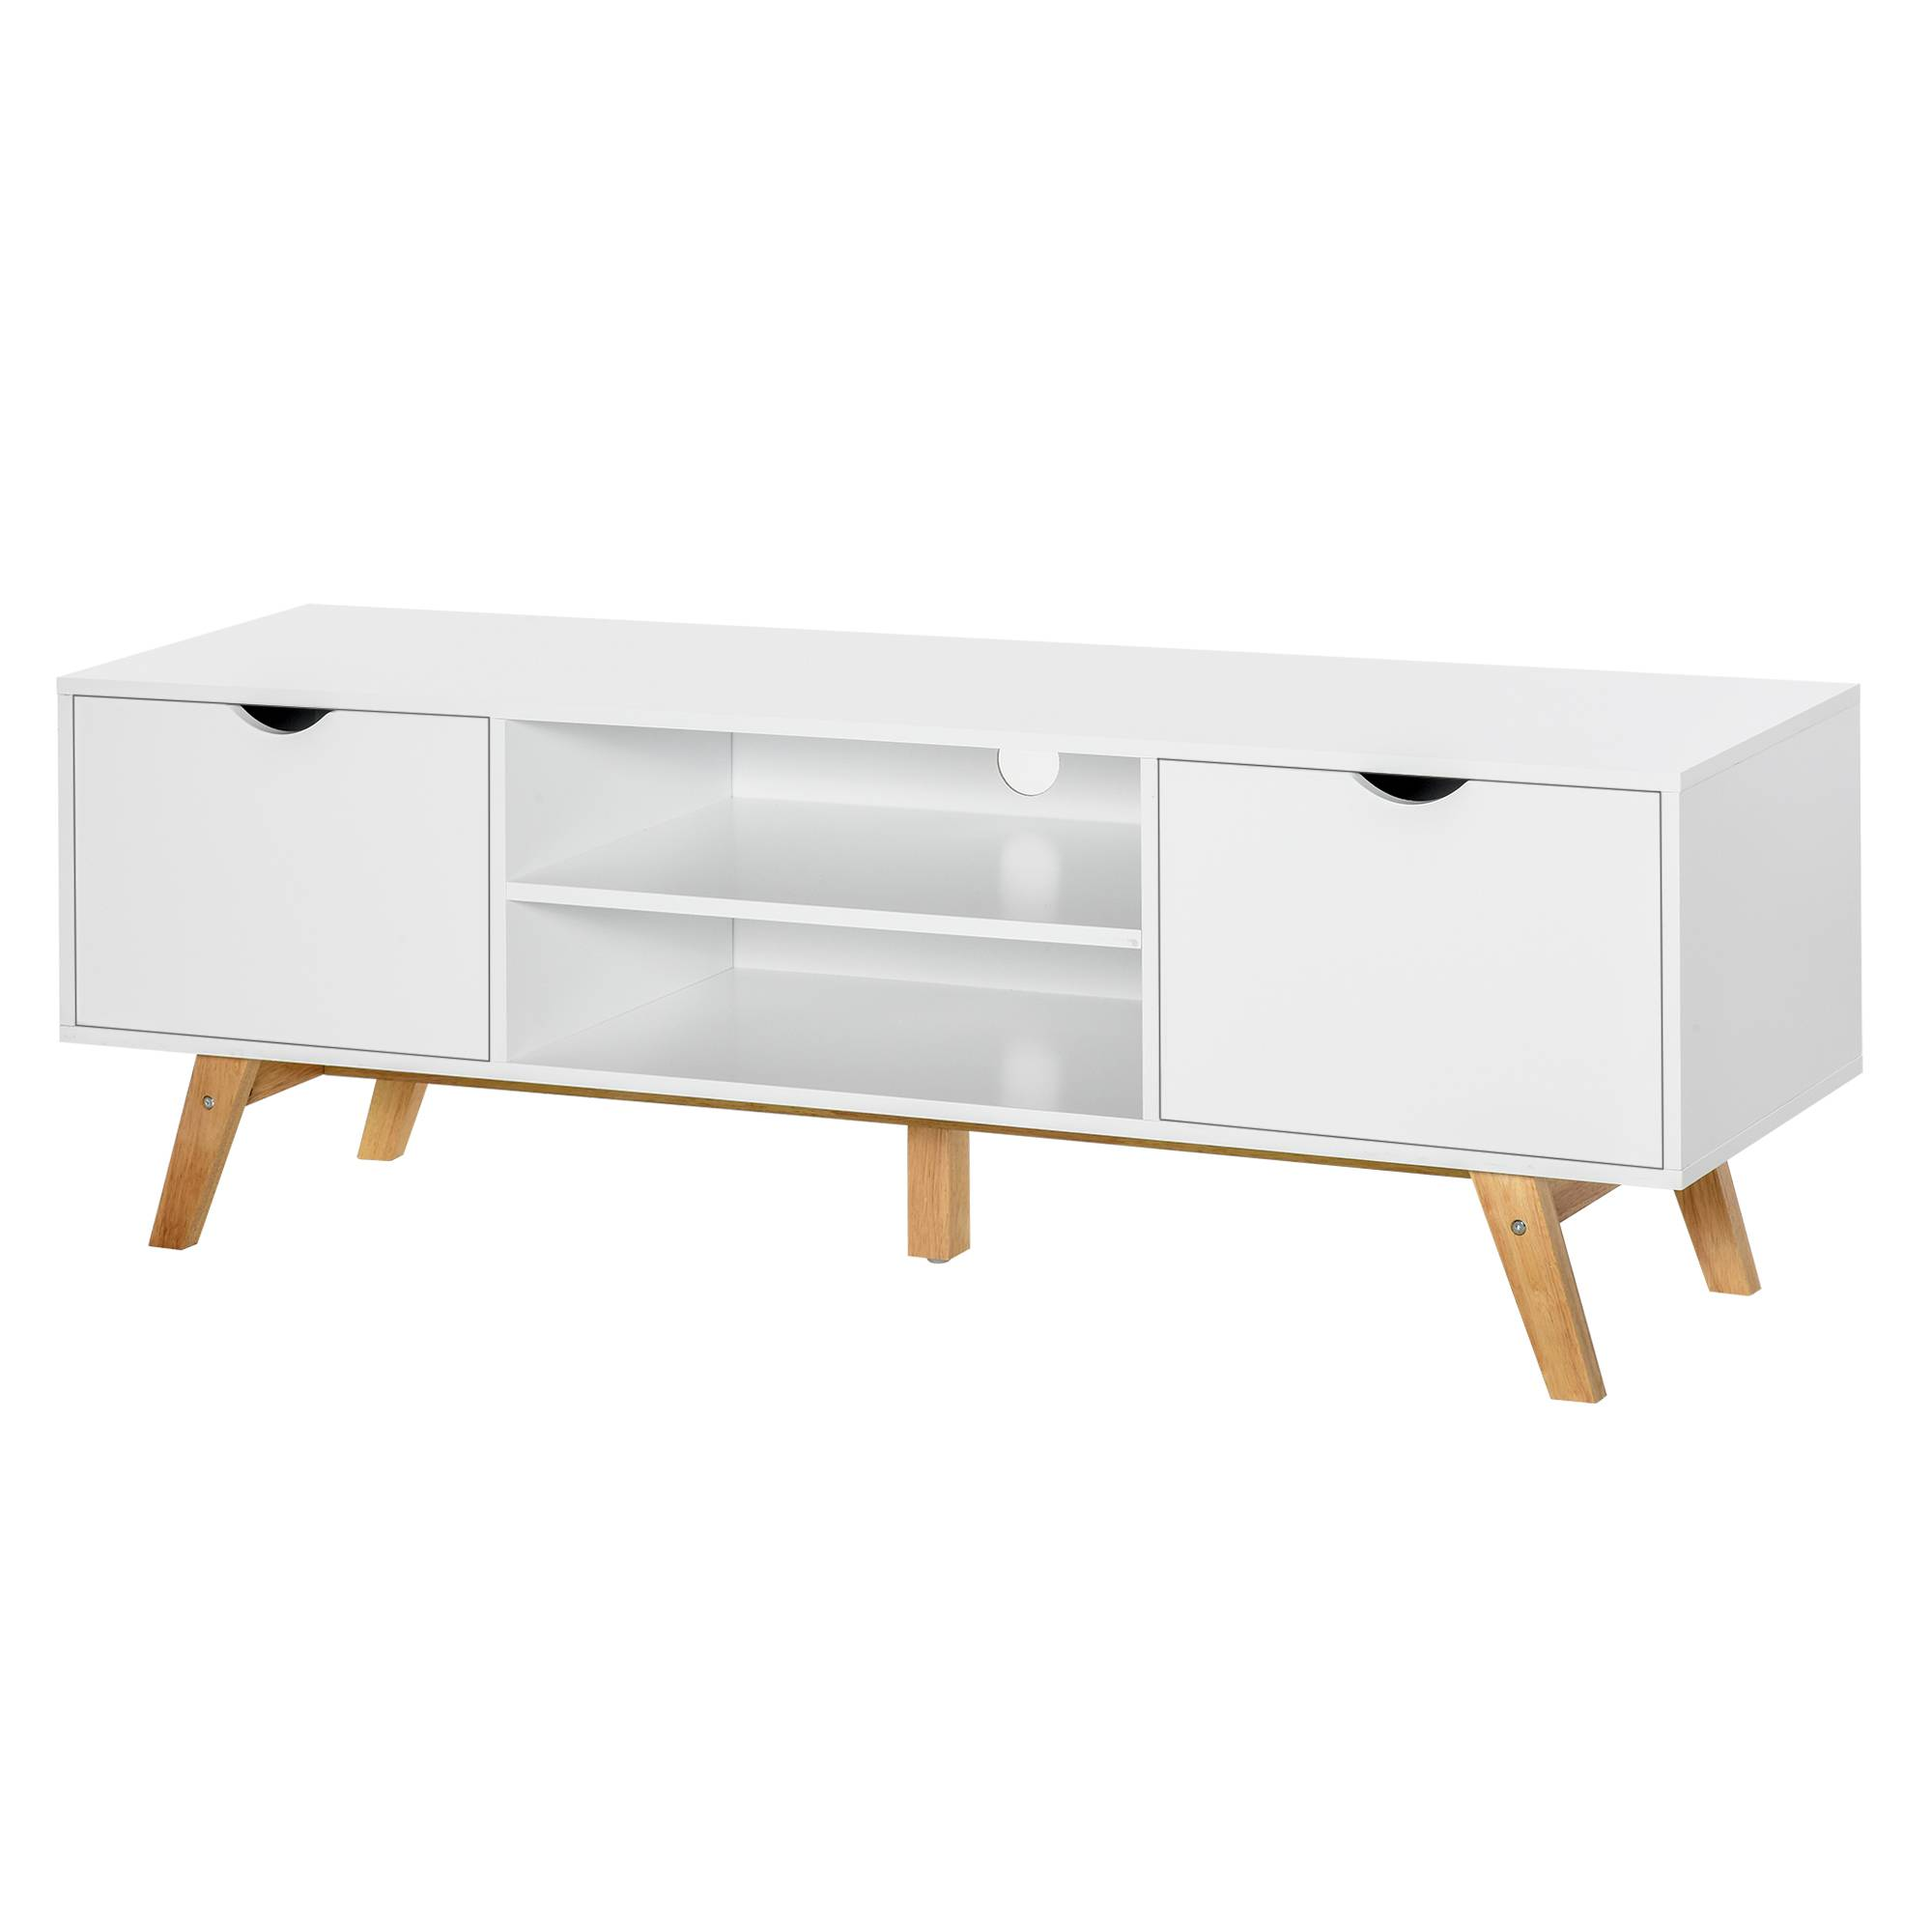 Homcom Meuble TV style scandinave 2 portes 2 niches blanc bois hévéa